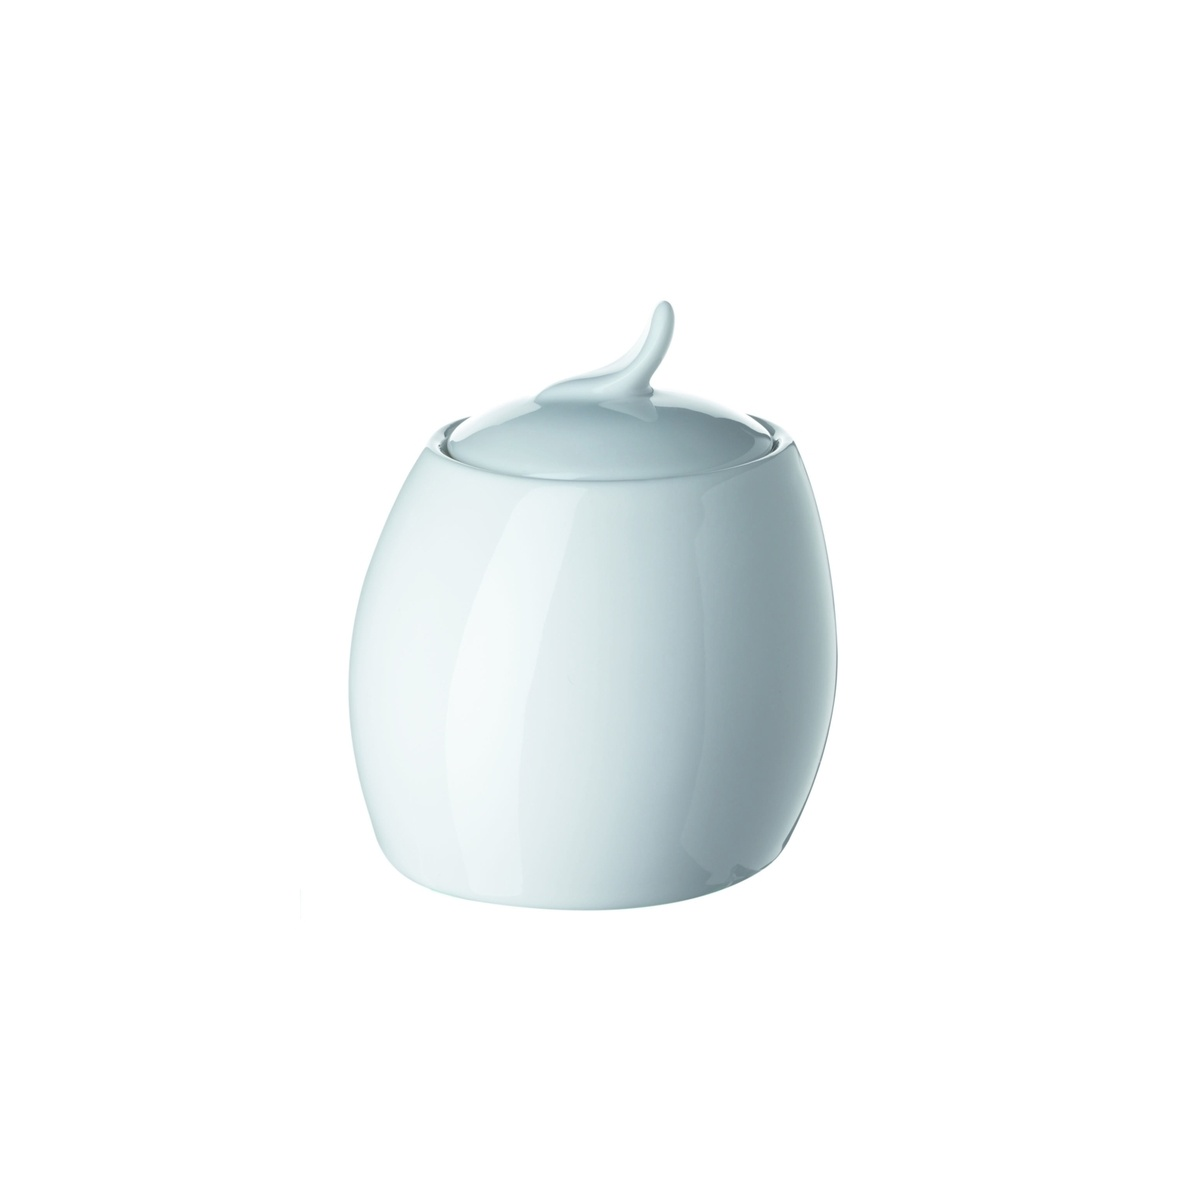 Mäser Porcelánová cukřenka La Musica, 250 ml